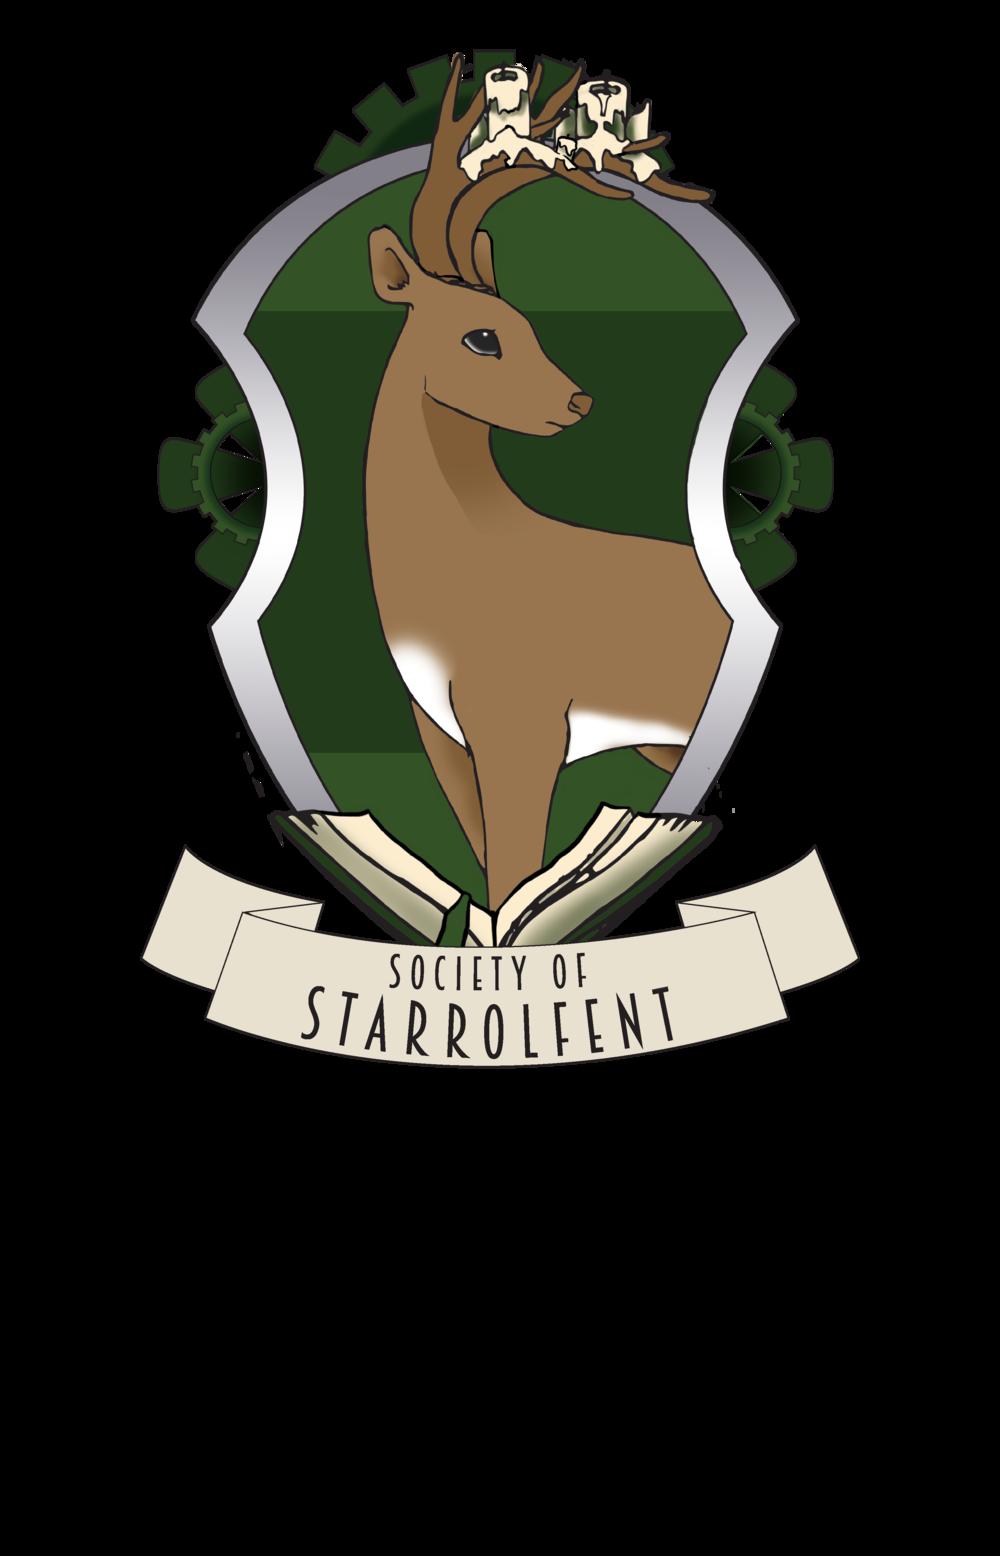 starrolfent-01.png